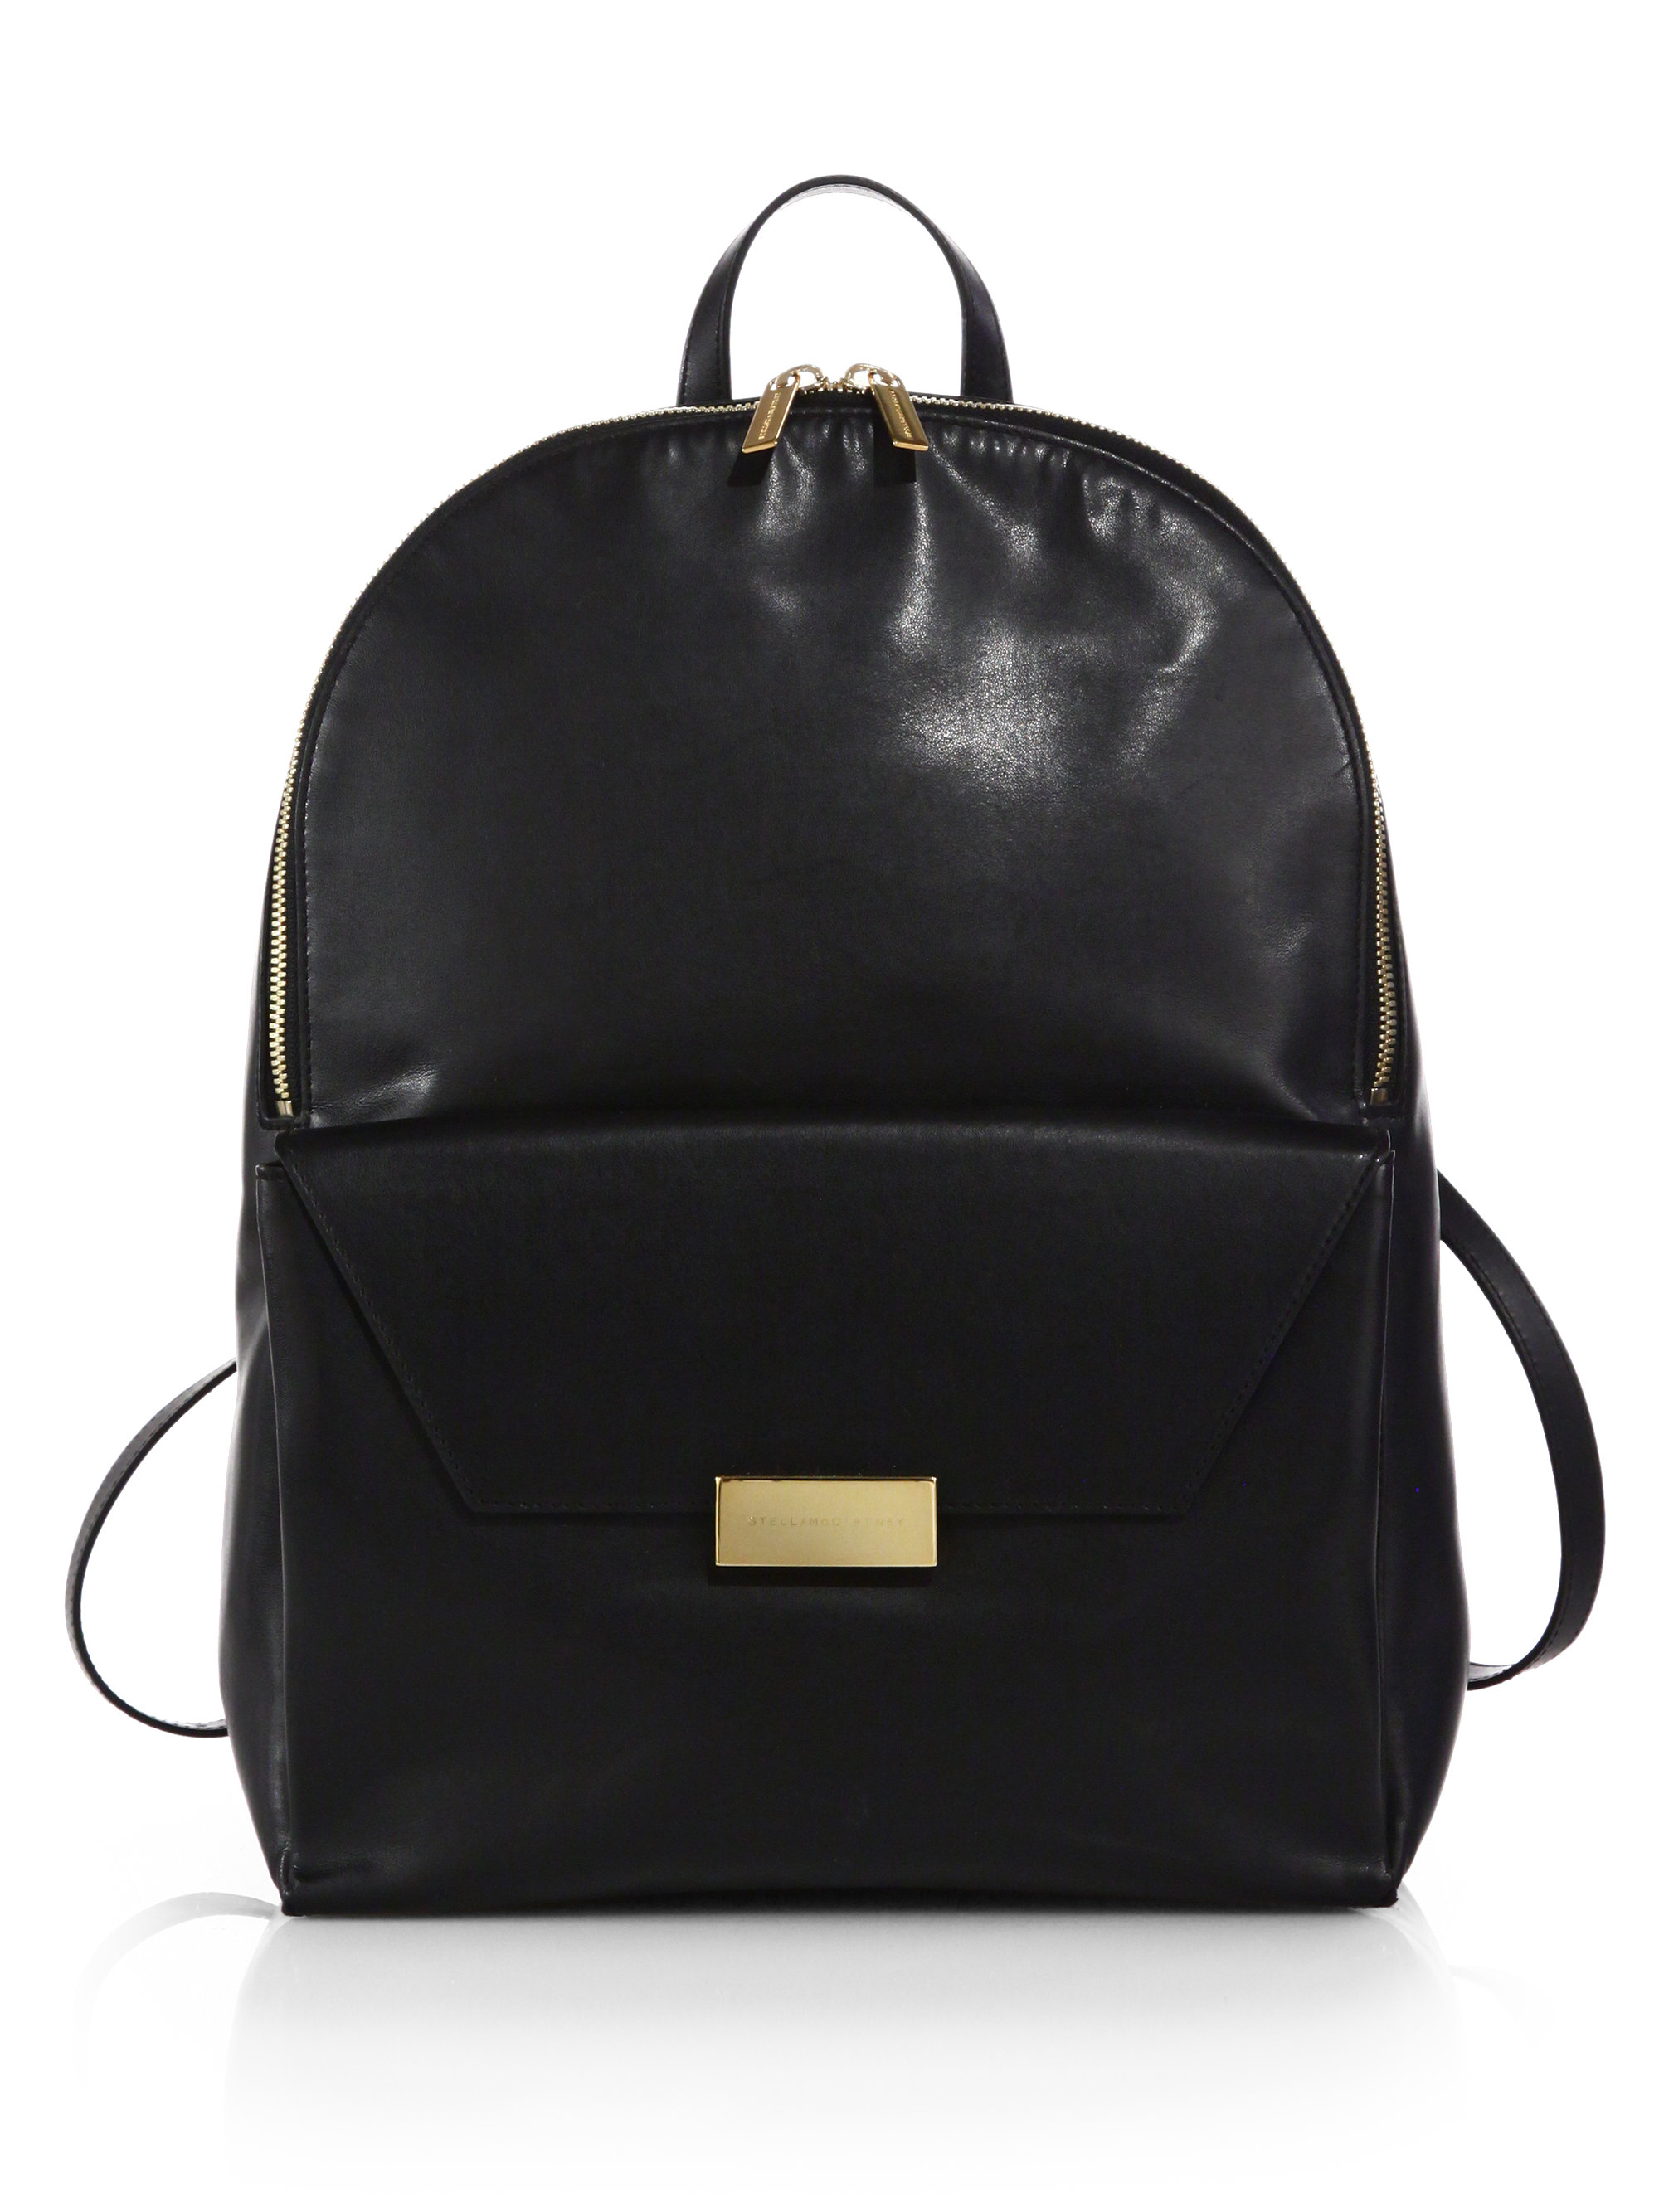 Stella mccartney Beckett Faux Leather Backpack in Black   Lyst